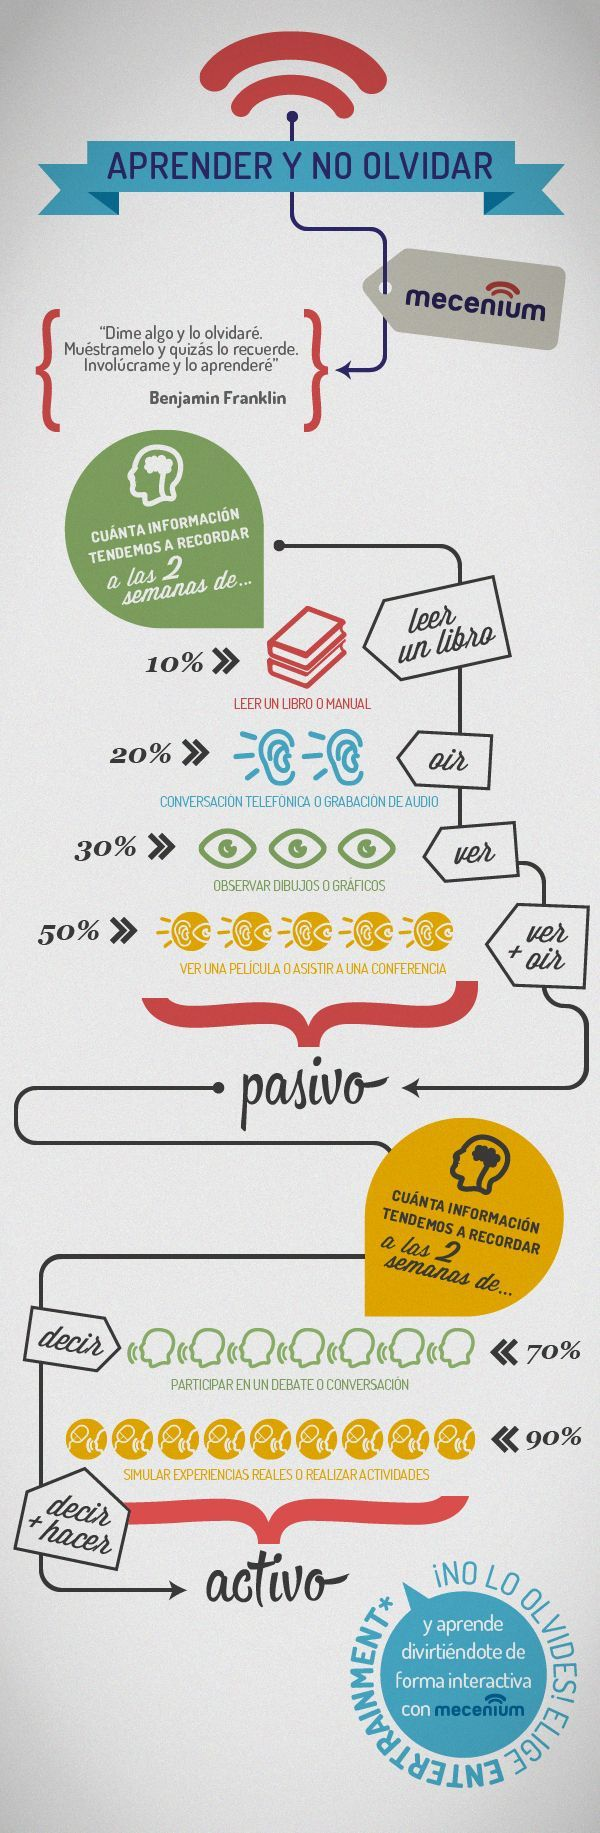 OlvidasLoAprendidoEscenariosActivosPasivos-Infografía-BlogGesvin